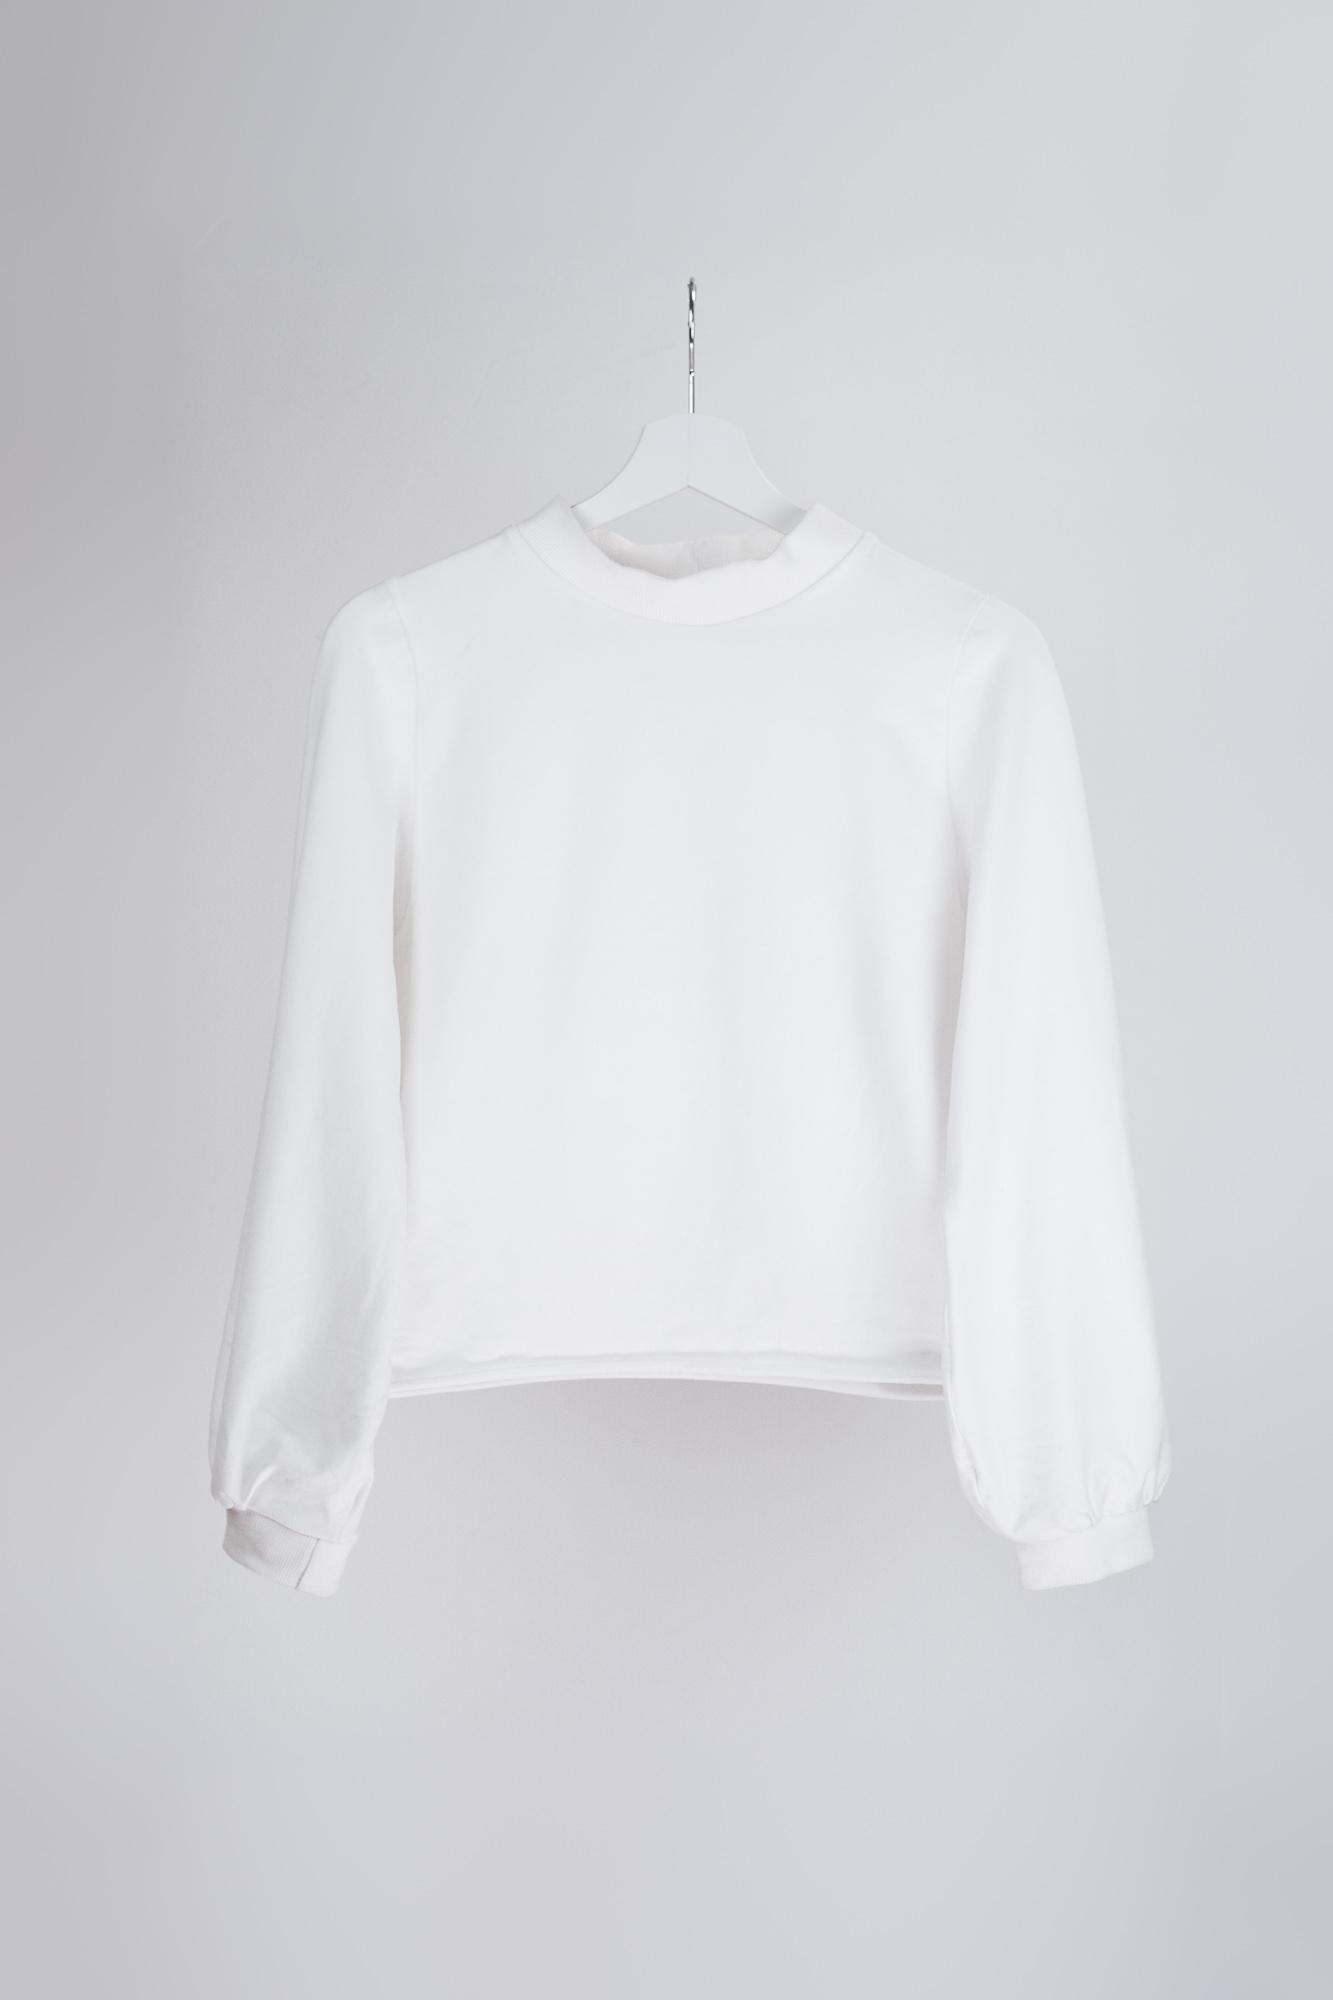 c1452388f8 Schnittmuster Langarm T-Shirt »ALAMOSA« aus der Kollektion »COLORADO«